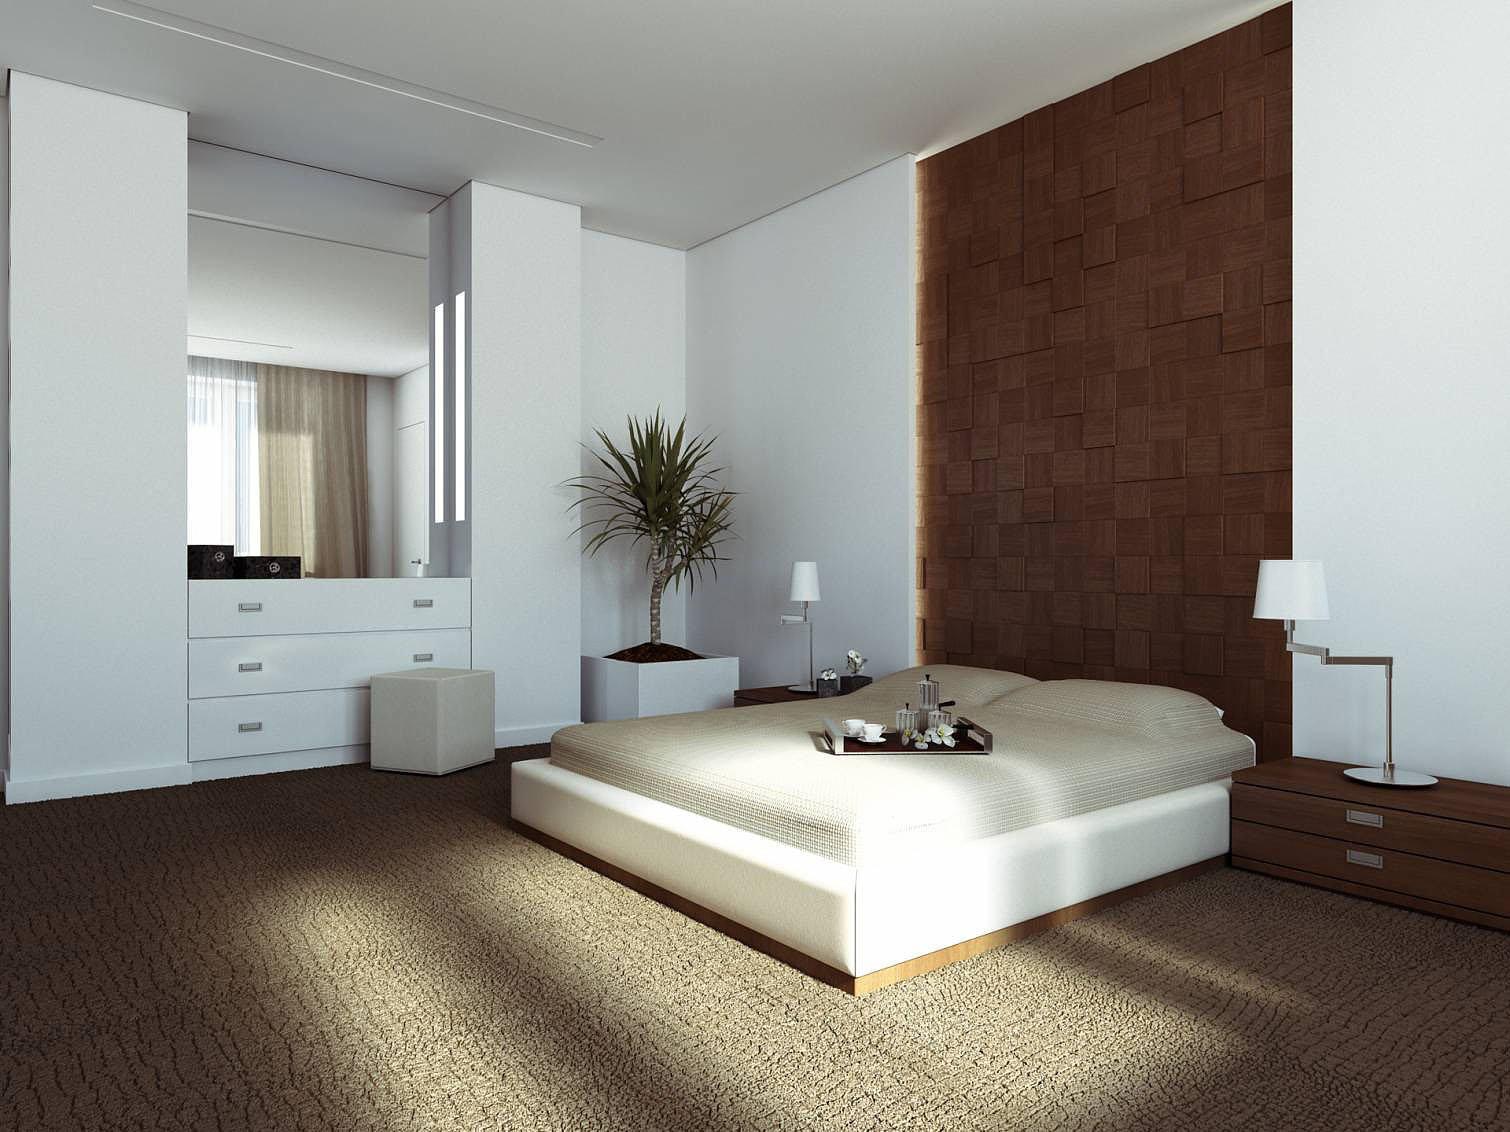 Apartment-Design-in-Moskovyan-Plaza-10